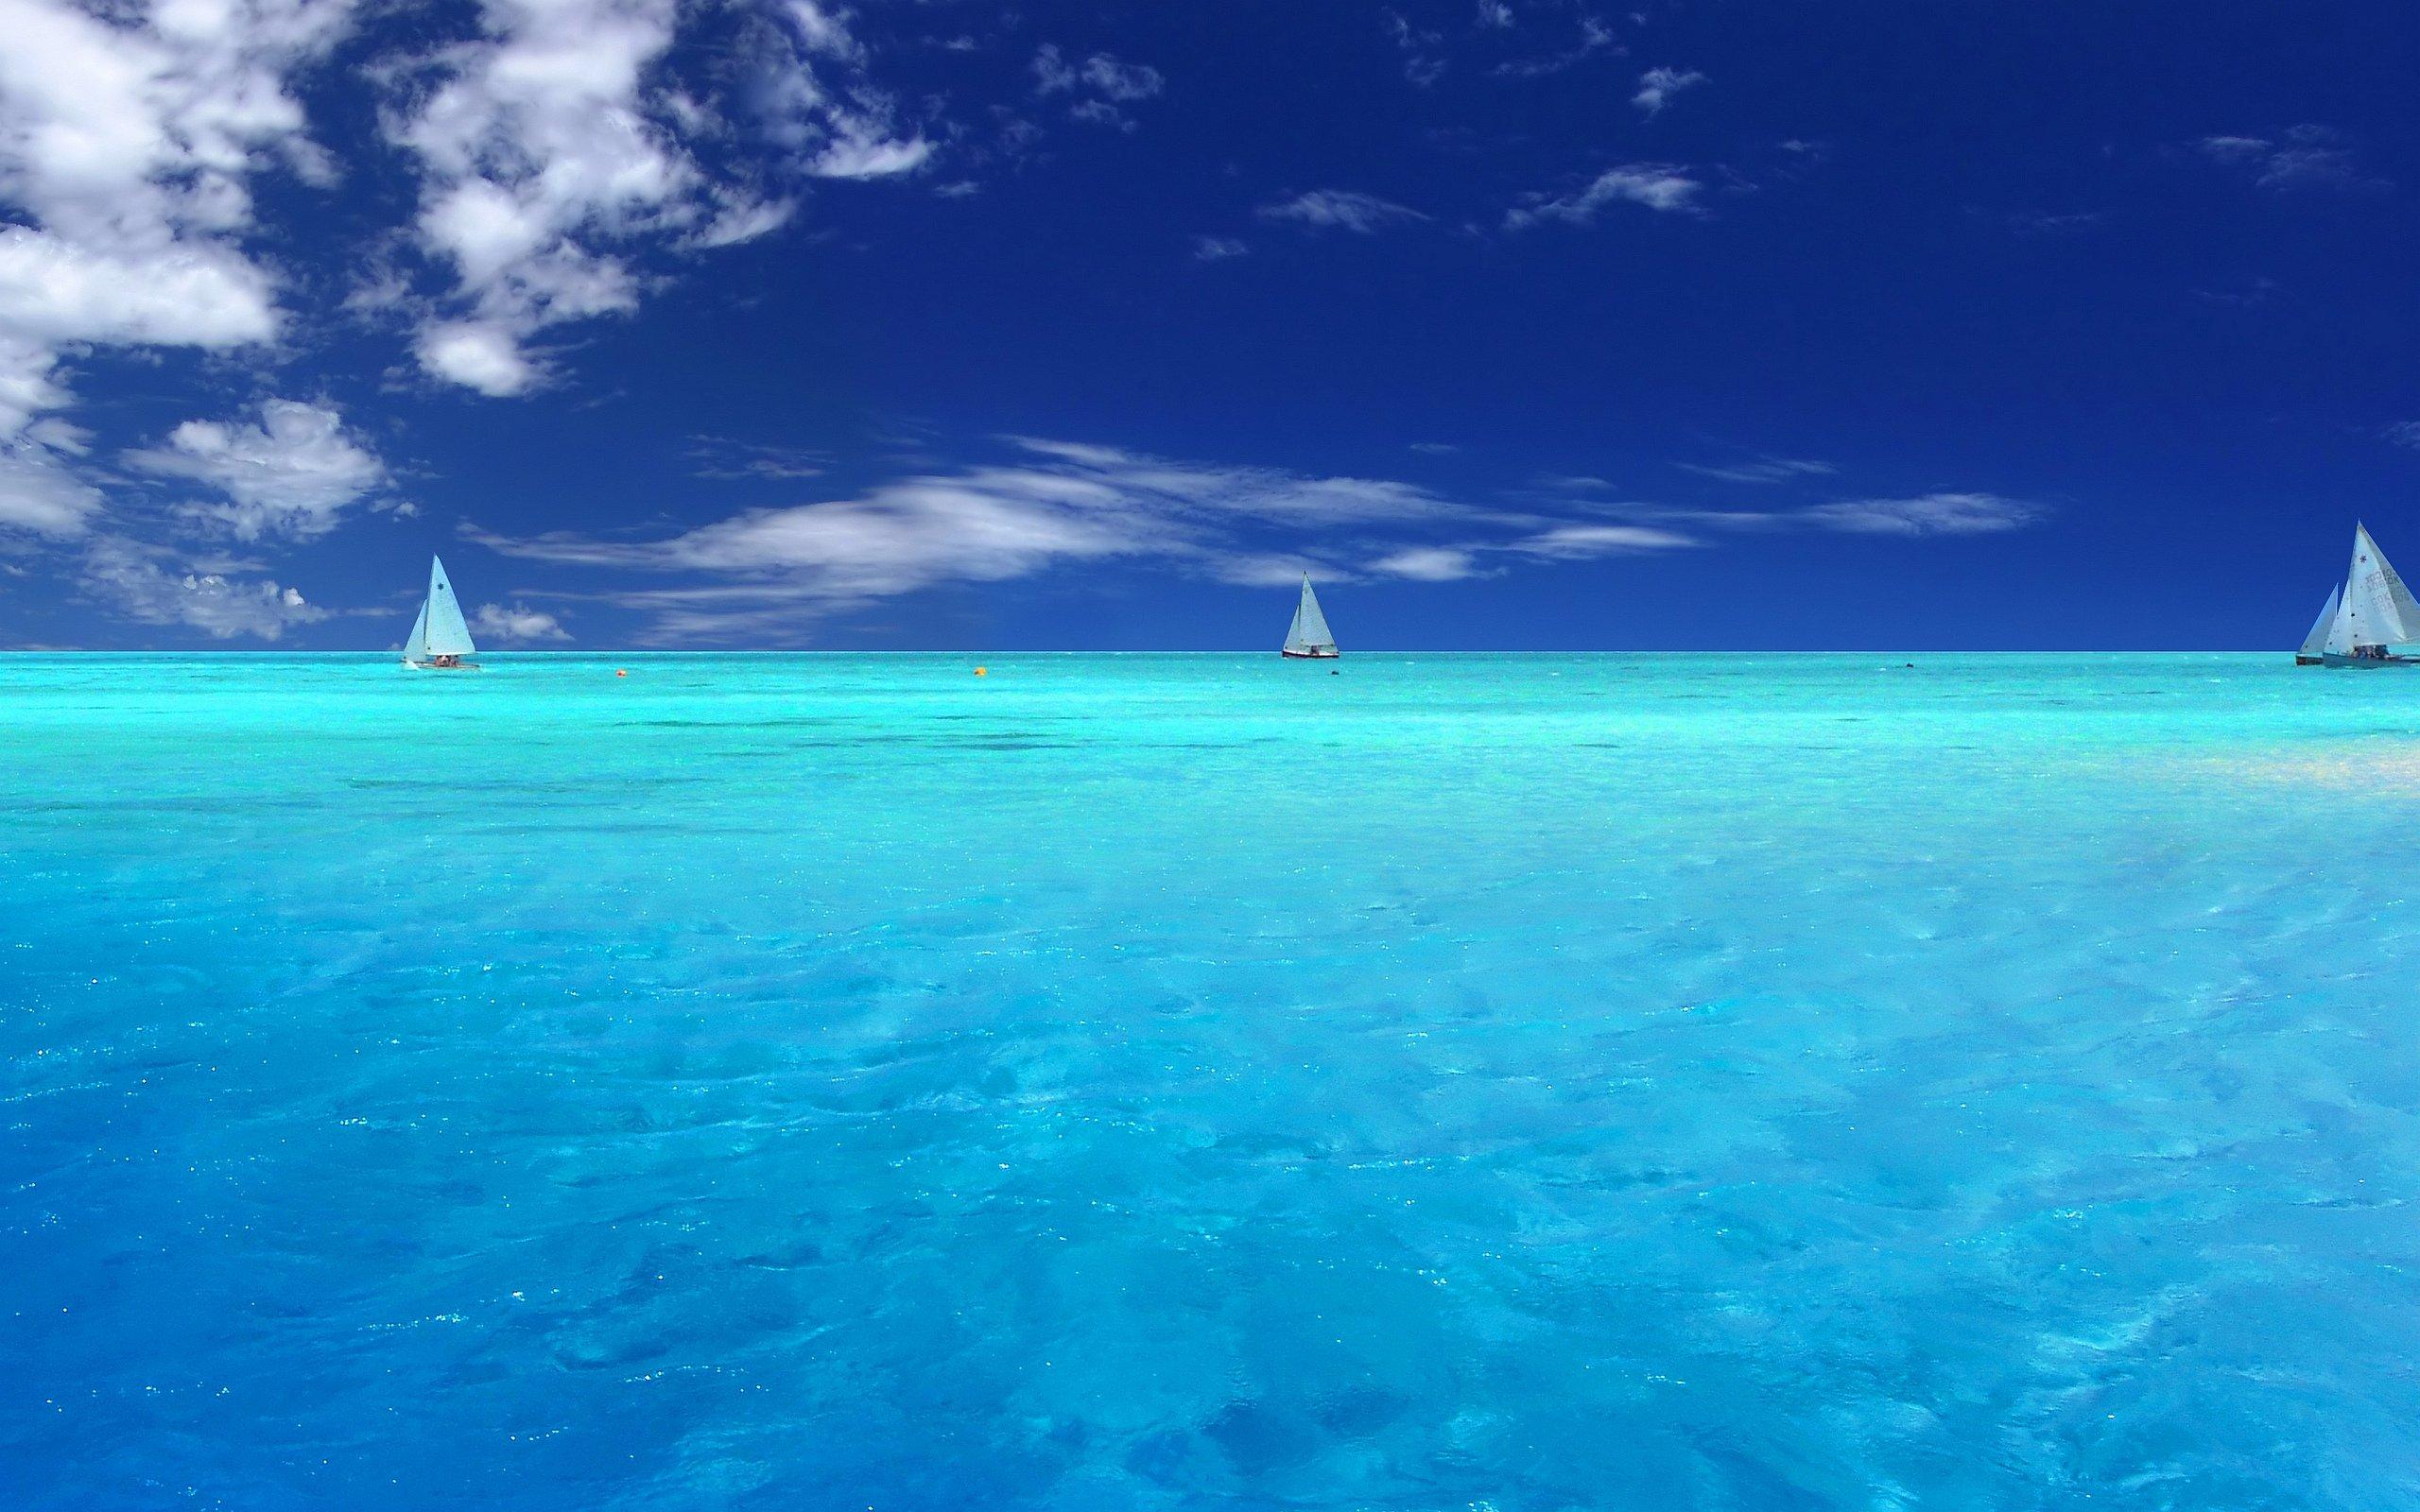 Free Wallpaper Ocean Scenes: Beach by Free download best ...